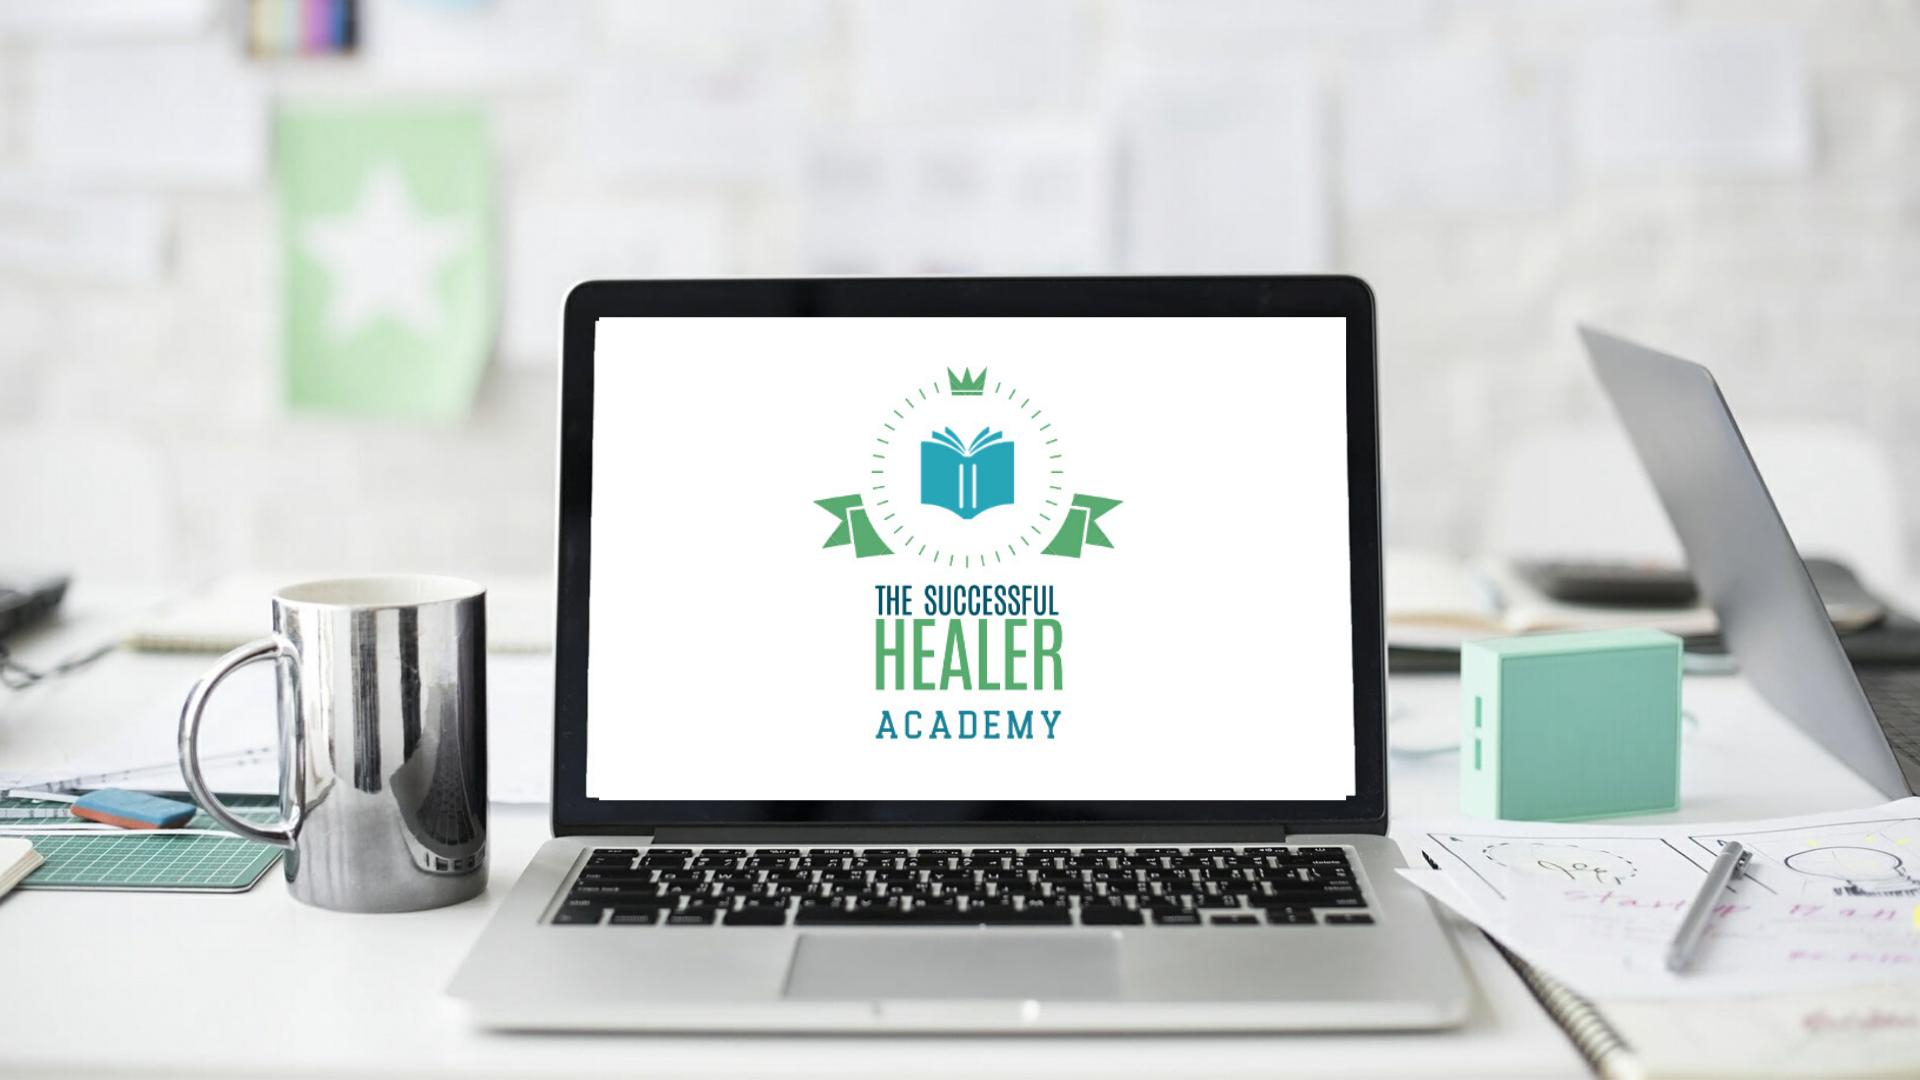 The Successful Healer Academy